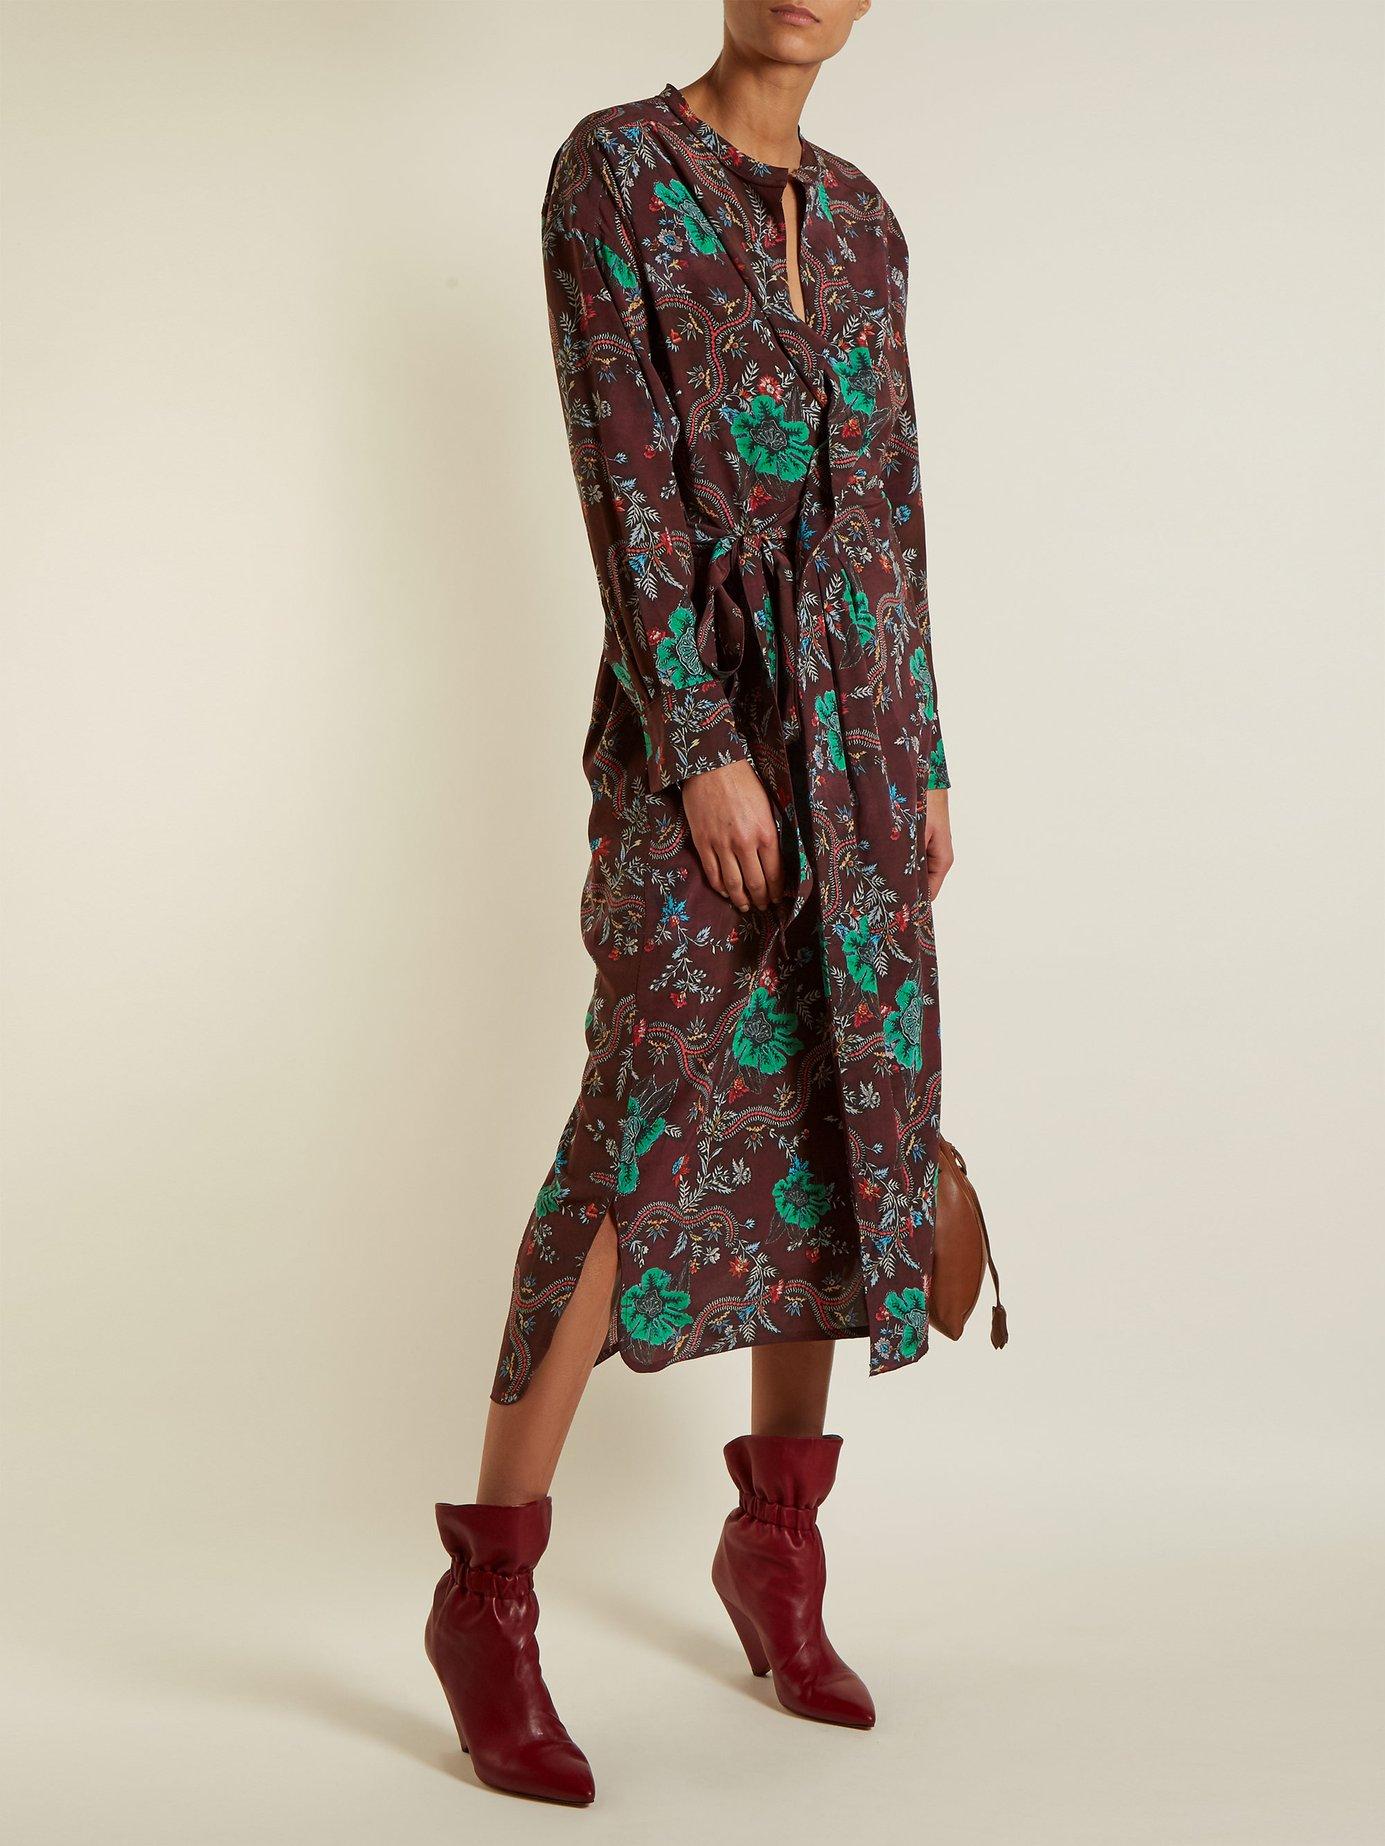 Calypso silk wrap dress by Isabel Marant